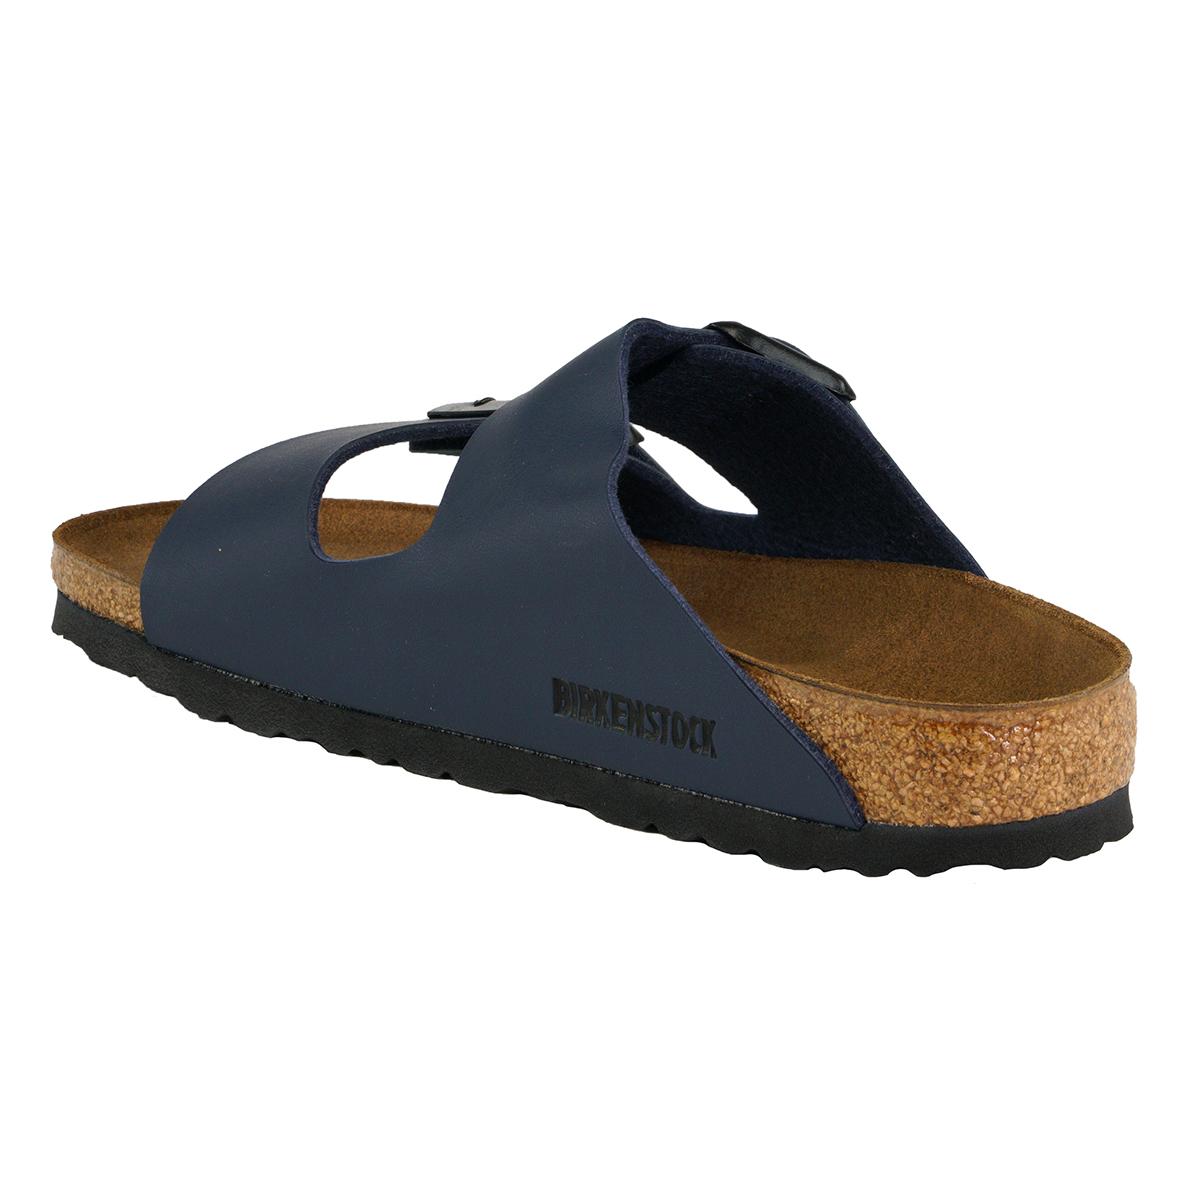 Birkenstock-Arizona-Sandals thumbnail 12